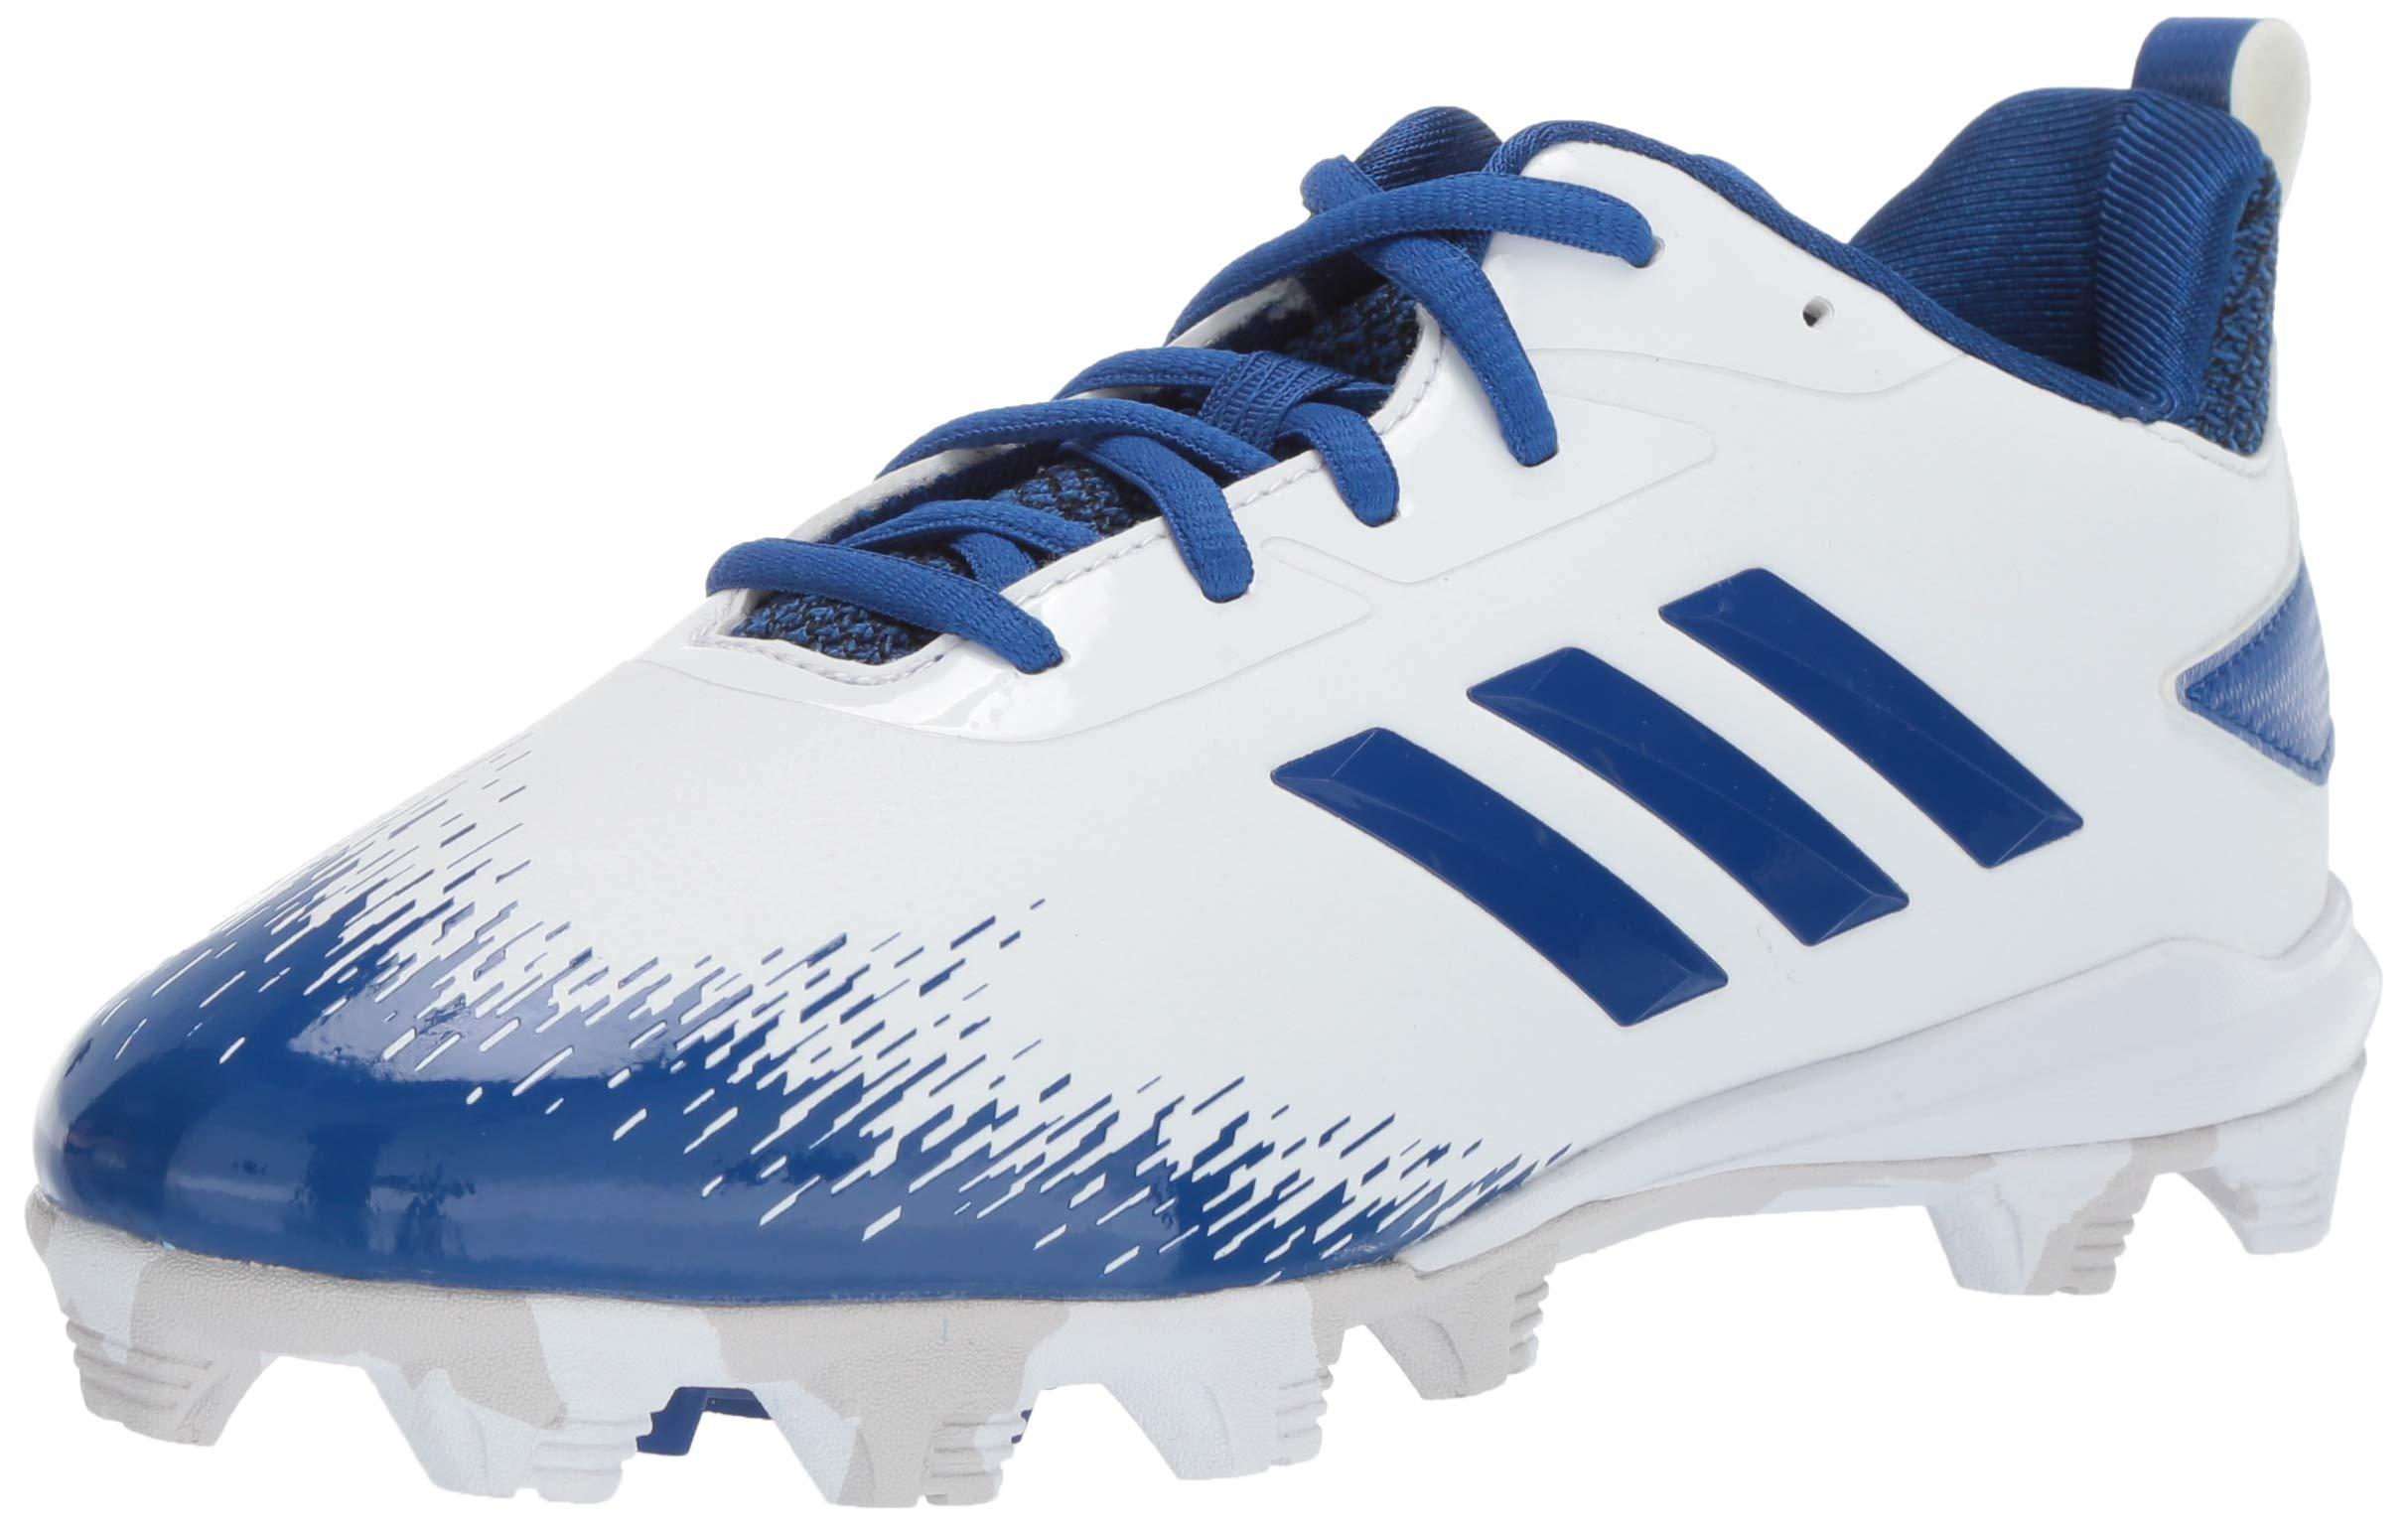 adidas Unisex Adizero Afterburner V Baseball Shoe, White/Collegiate Royal/Grey, 1.5 M US Little Kid by adidas